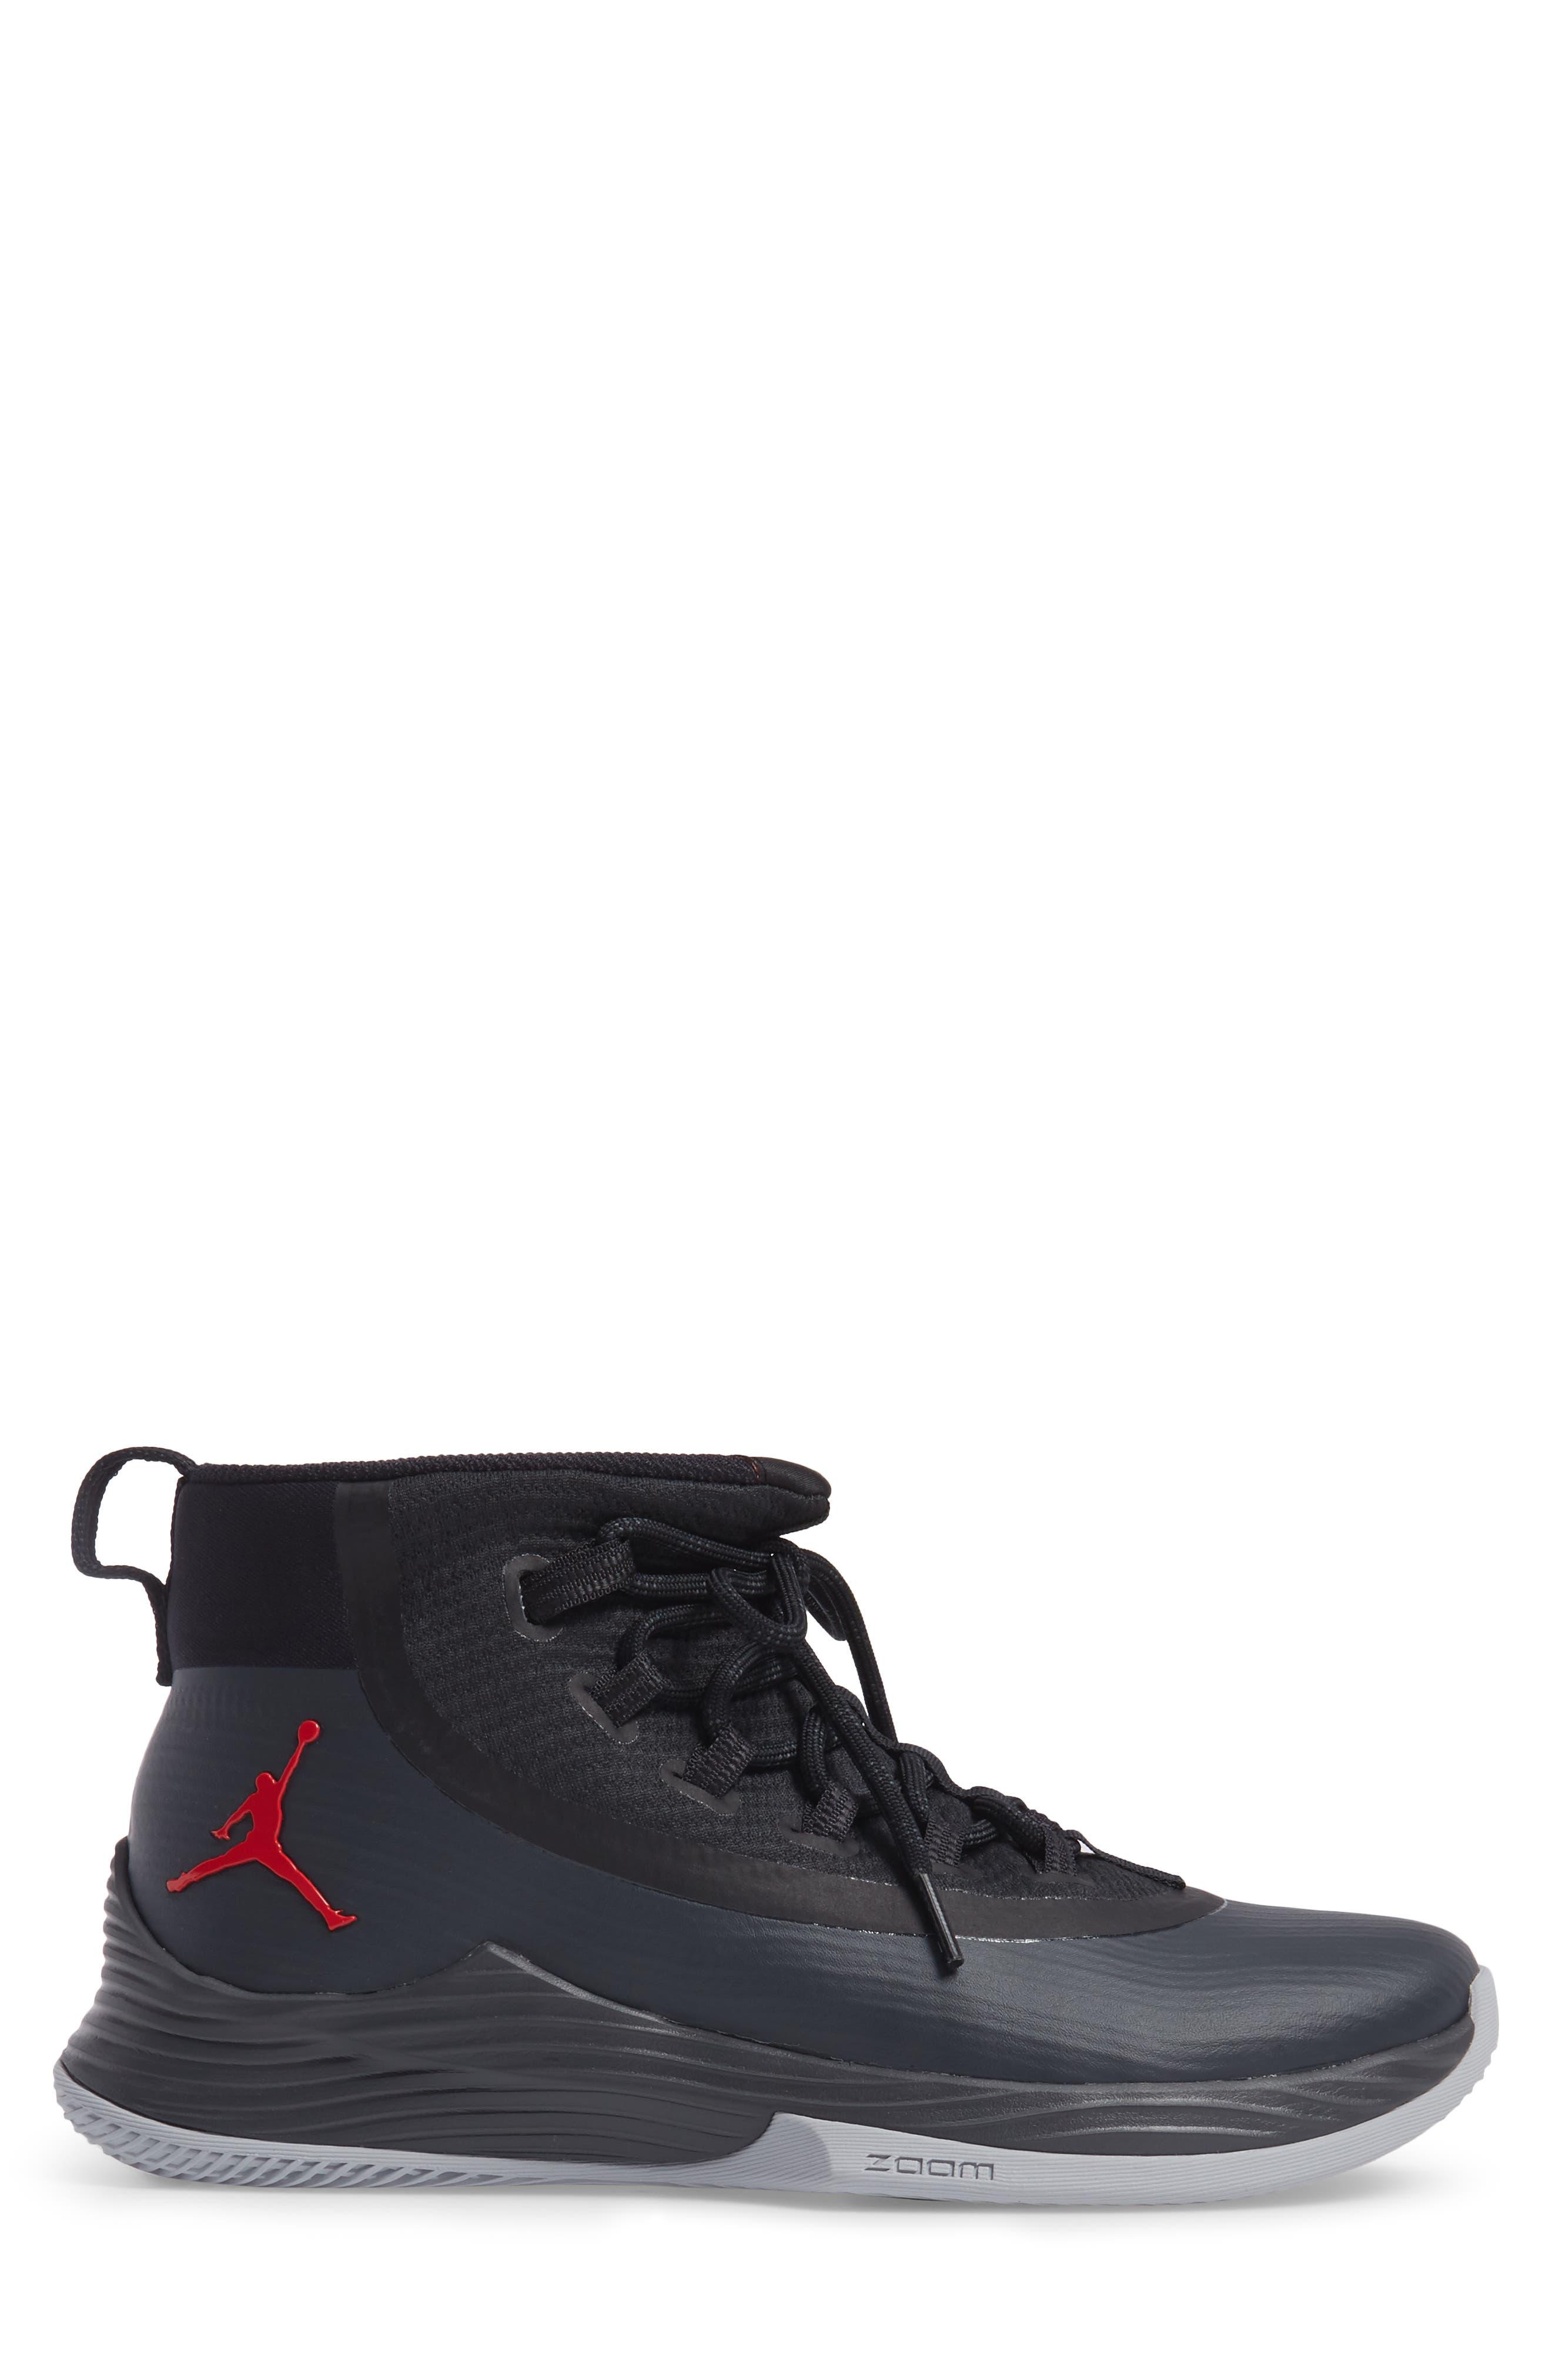 Jordan Ultra Fly 2 Basketball Shoe,                             Alternate thumbnail 3, color,                             002